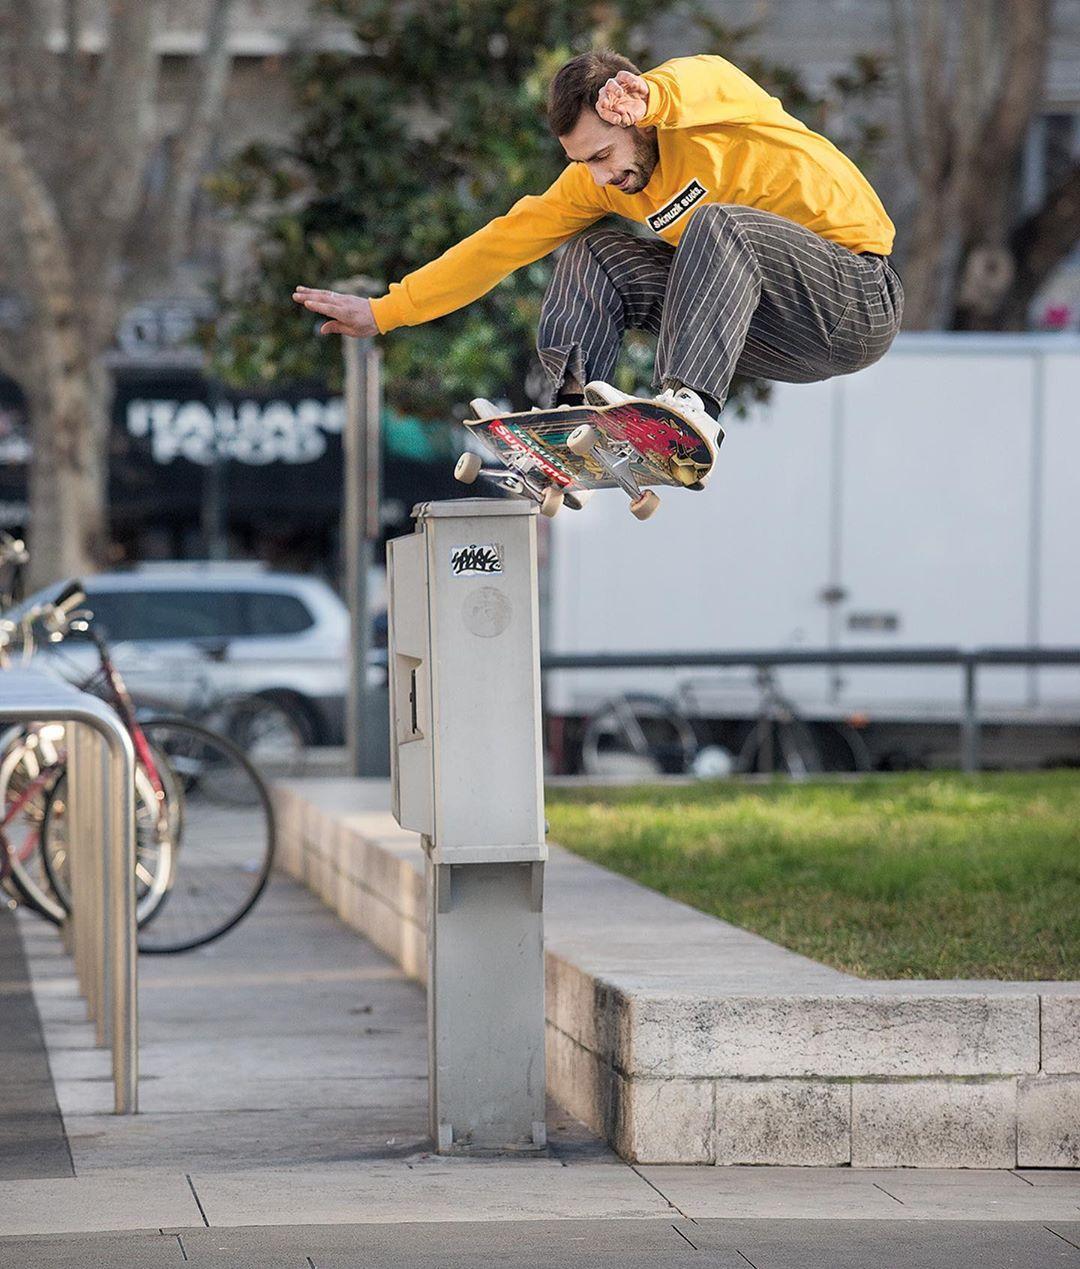 Pin von Vibe Hero auf Skateboarding in 2020 H.i.s